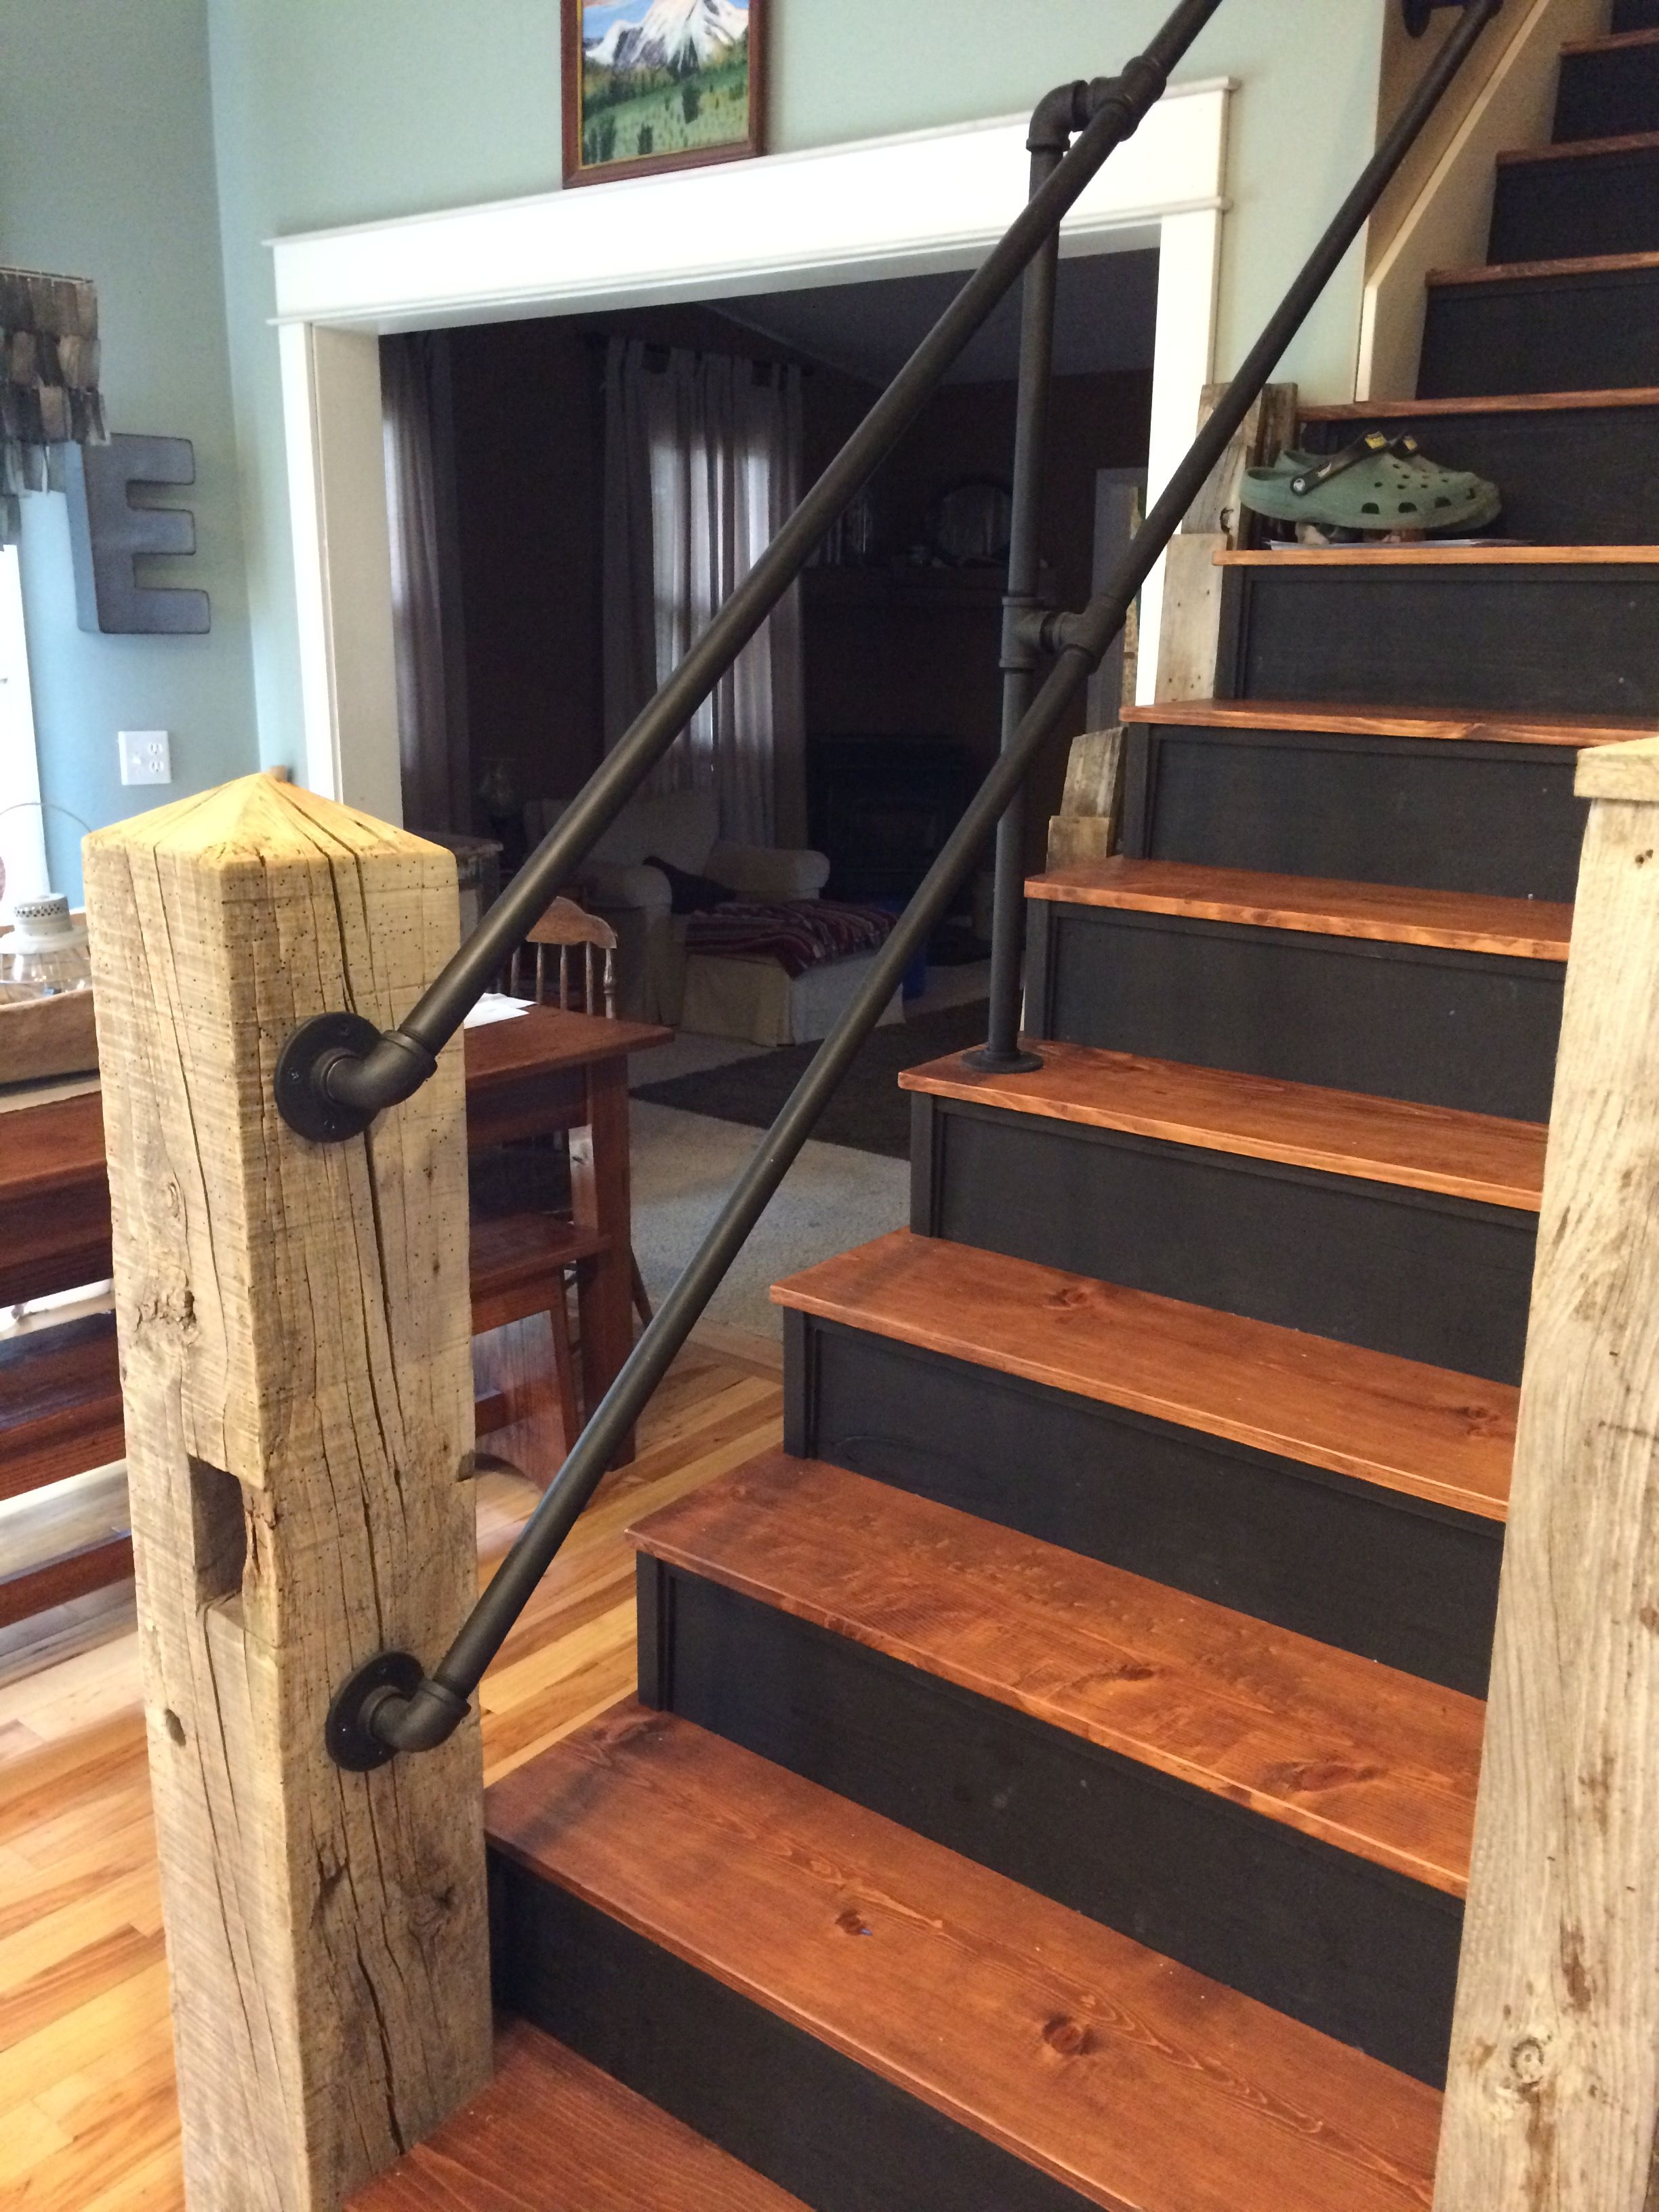 Pin On Garage Ideas | Black Iron Pipe Handrail | Cast Iron | Horizontal Pipe | Paint Pipe | Stair Outdoor Decatur | Railing Aluminium Pipe